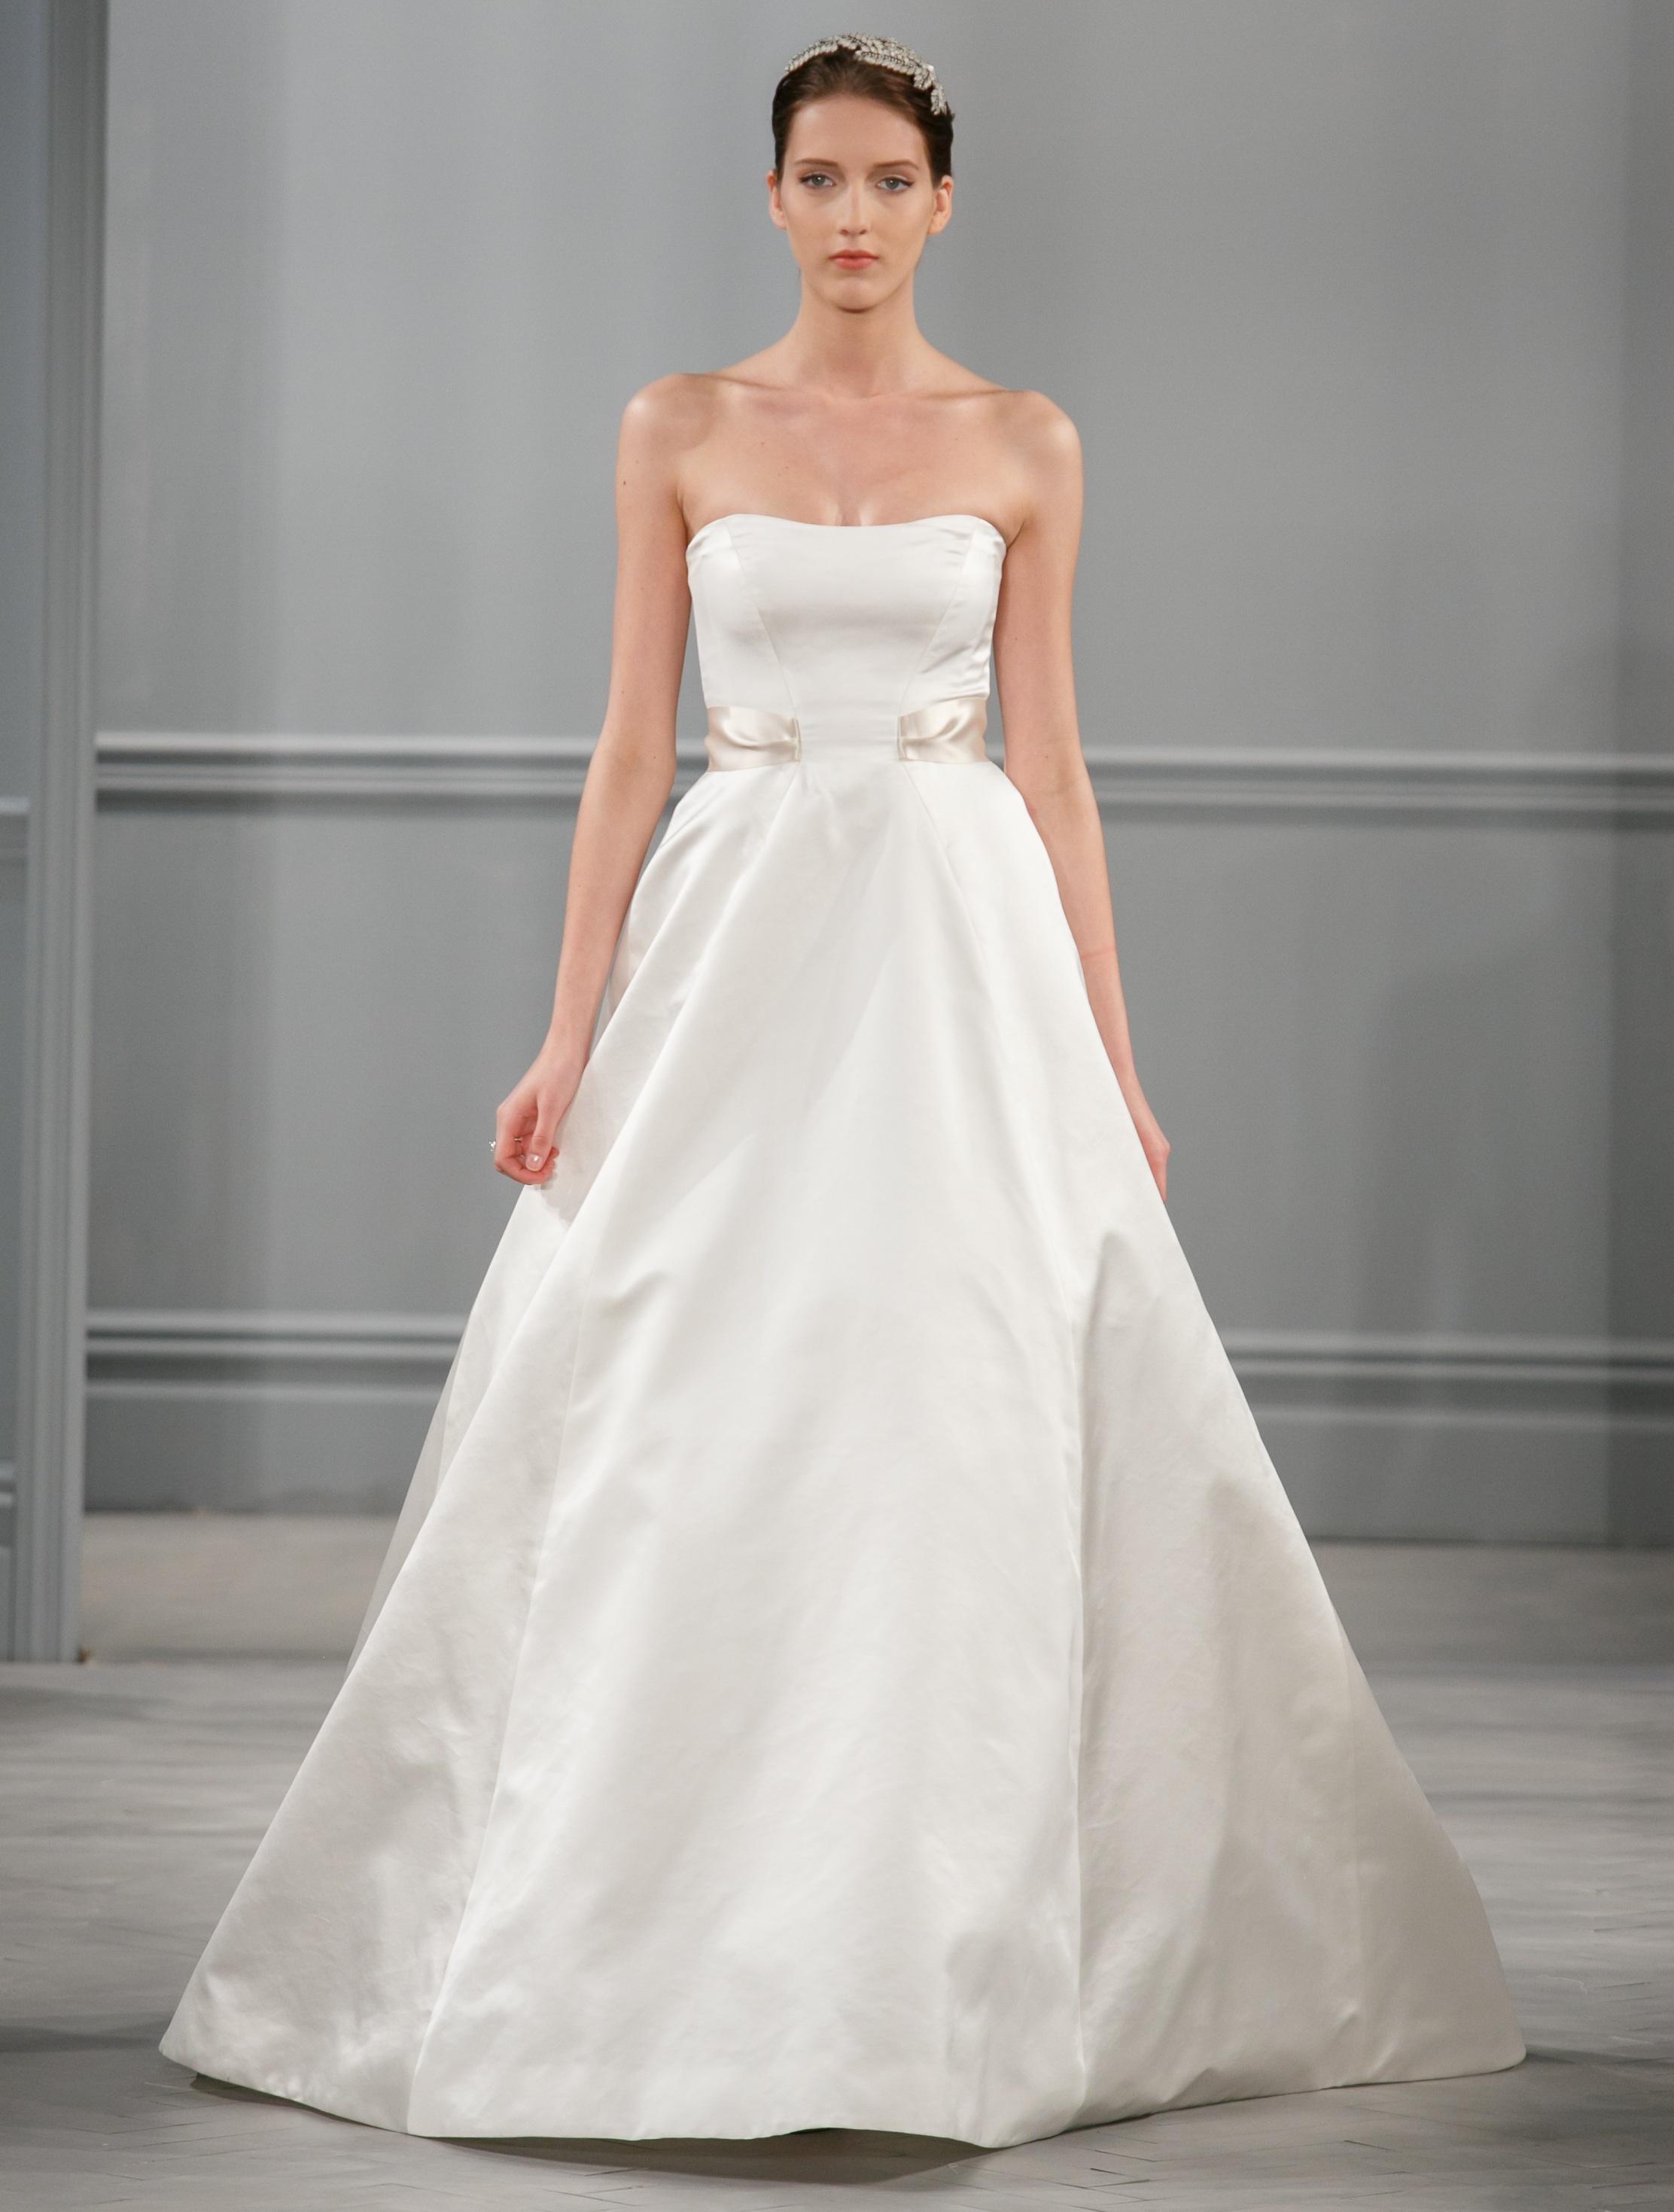 Spring 2014 wedding dress monique lhuillier bridal satine for Buy monique lhuillier wedding dress